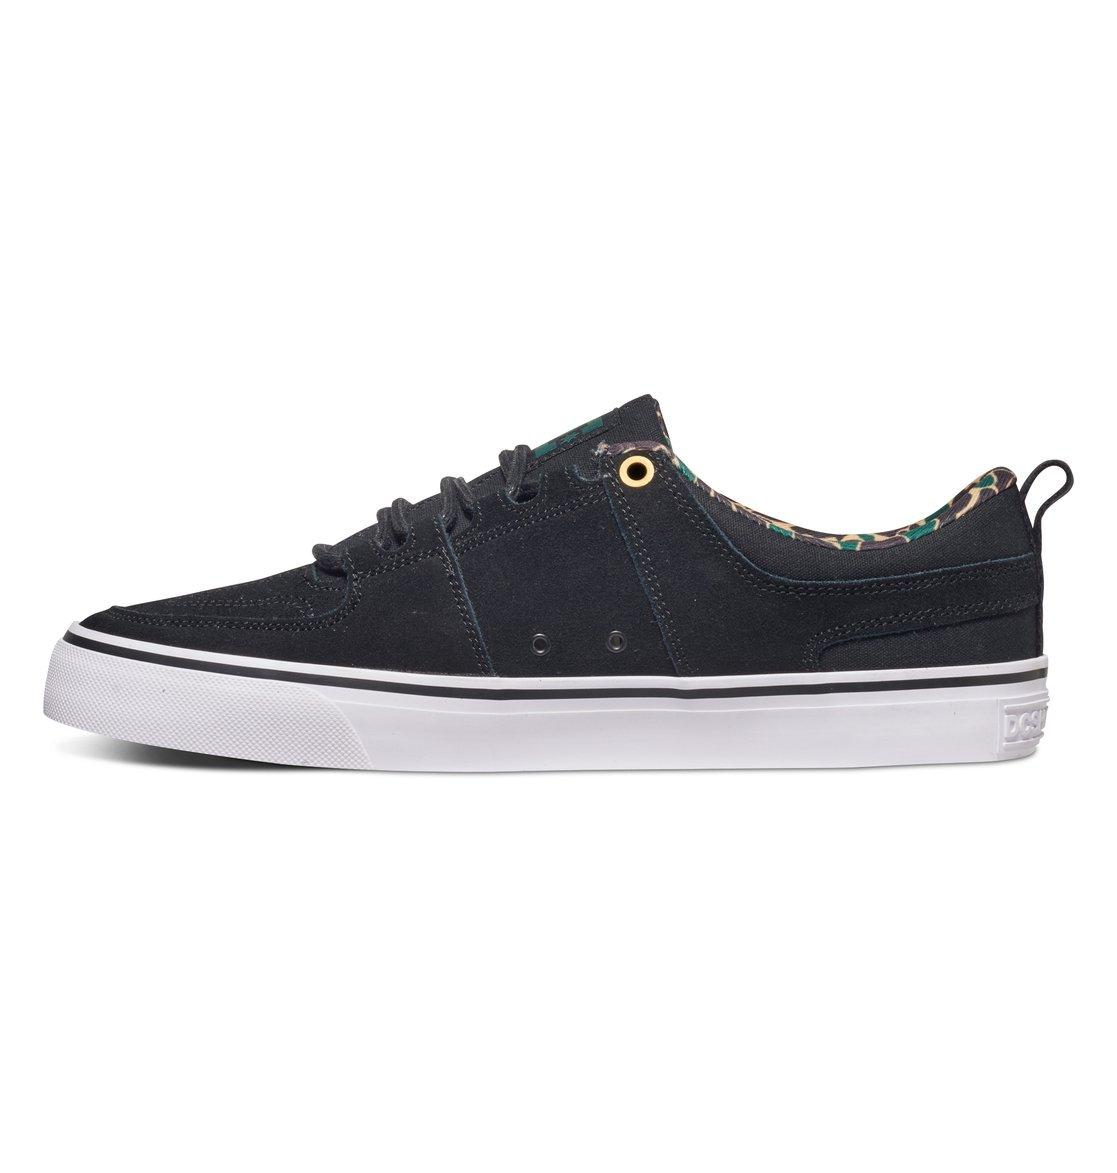 Dc Shoes Lynx Vulc Zapatillas, Color: White, Talla: 46 EU / 12 US / 11 UK